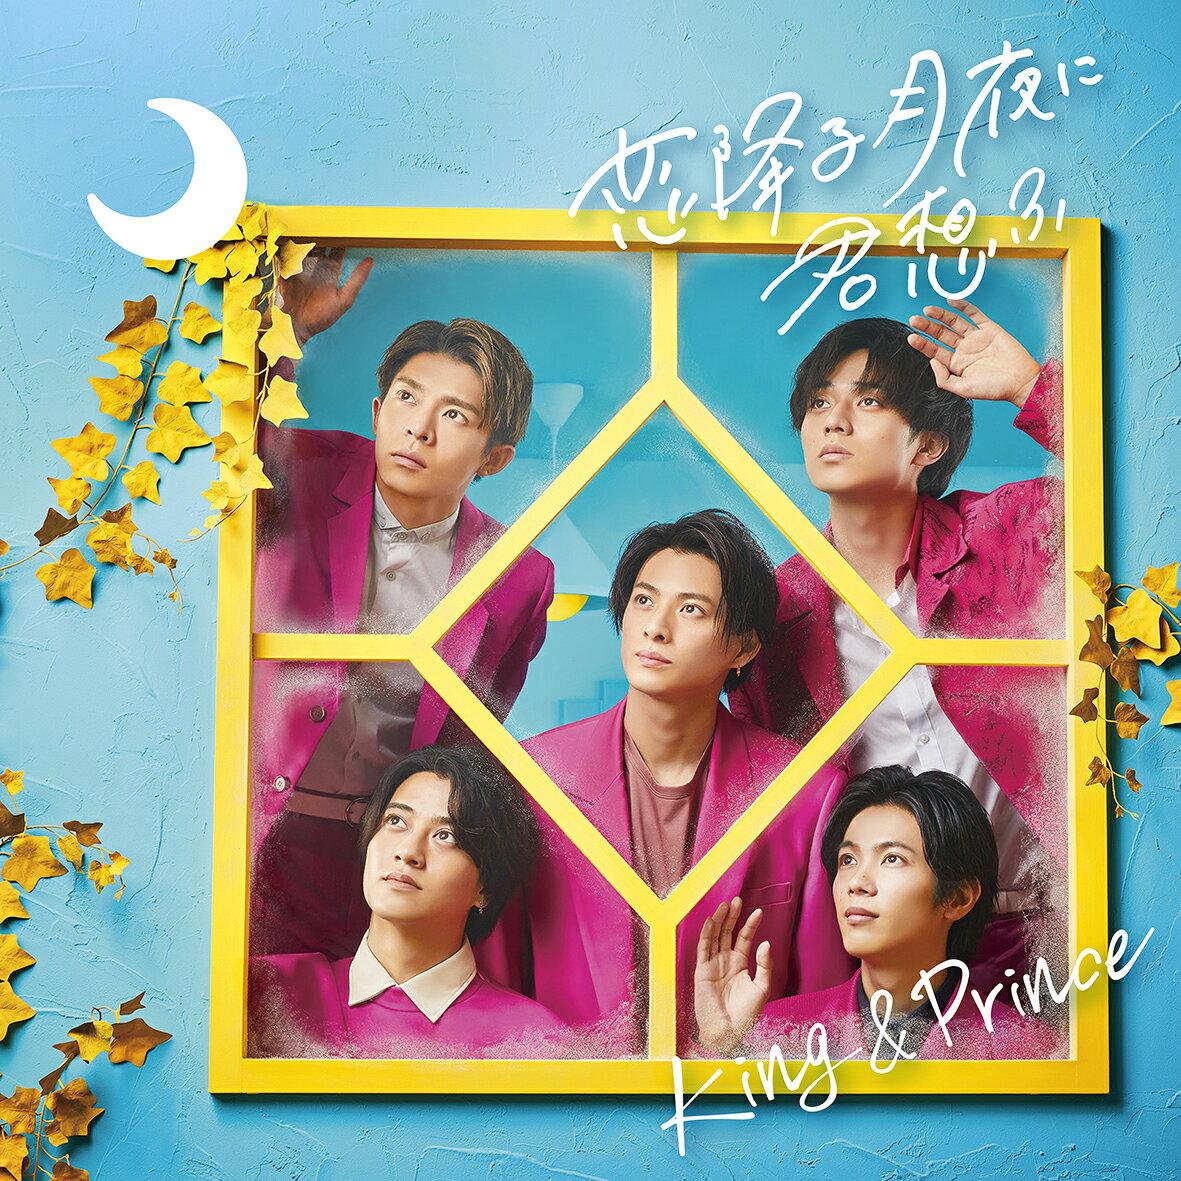 『King & Prince - Easy Go』収録の『恋降る月夜に君想ふ』ジャケット